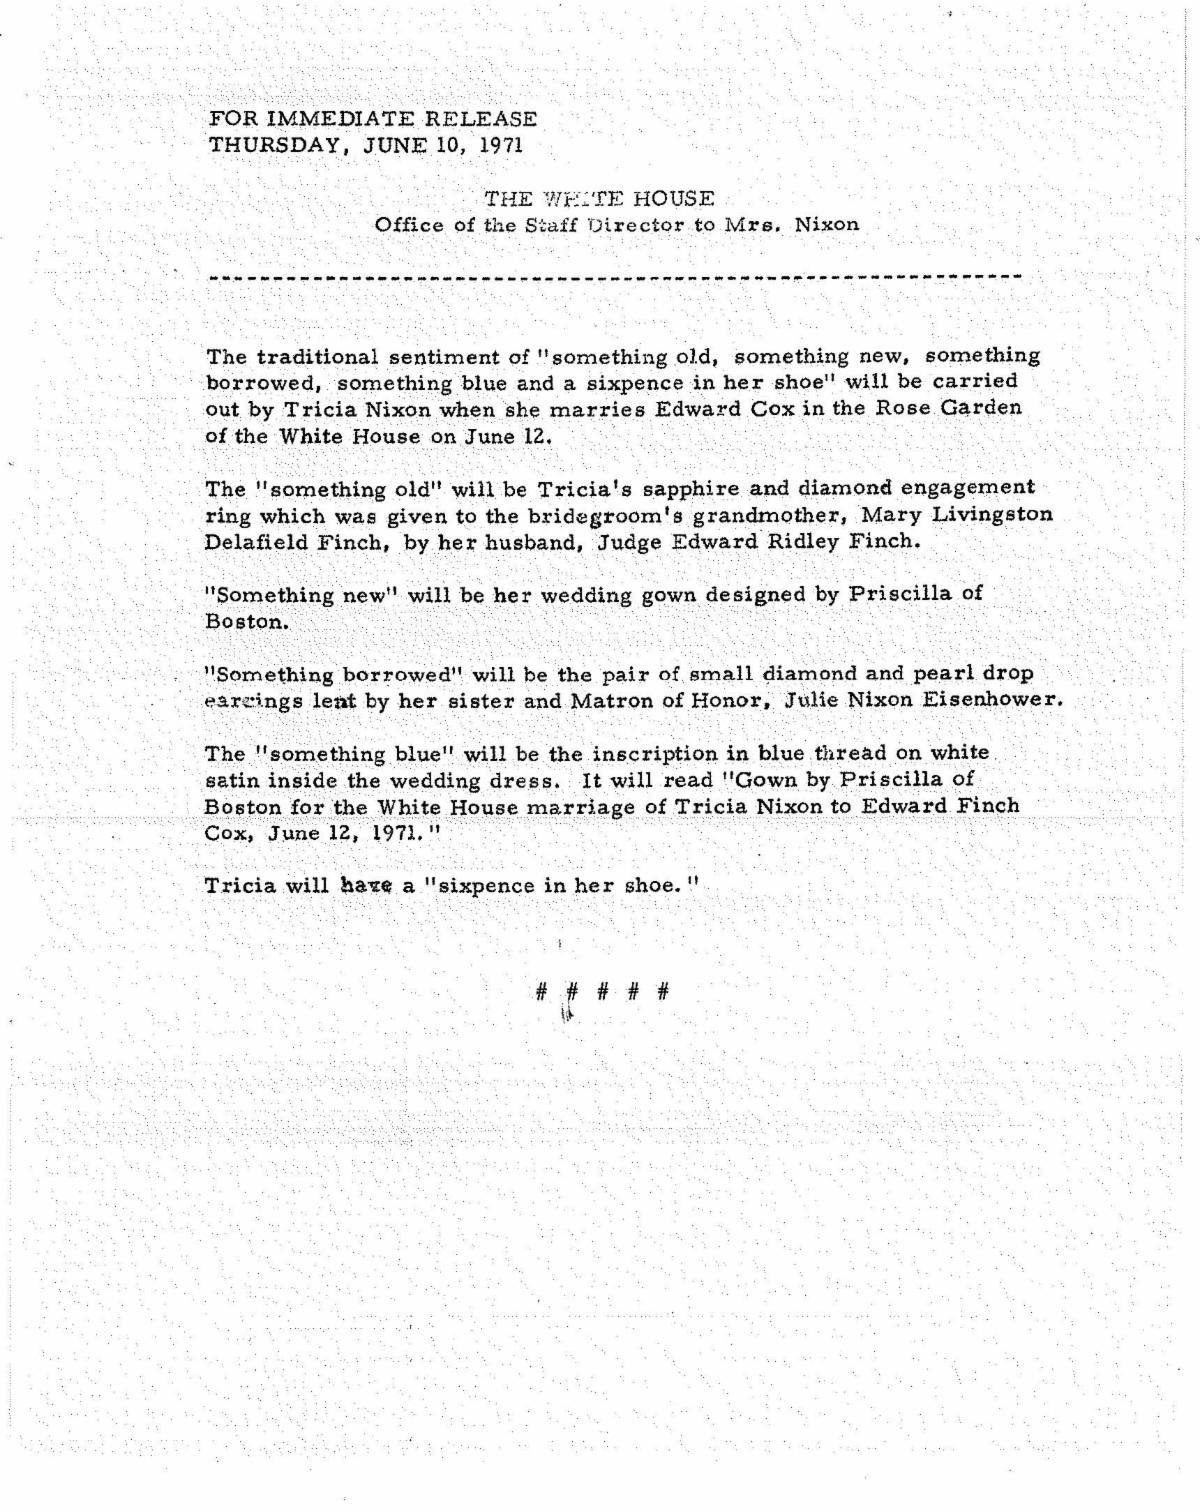 TNC wedding releated_press releases _2_.jpg